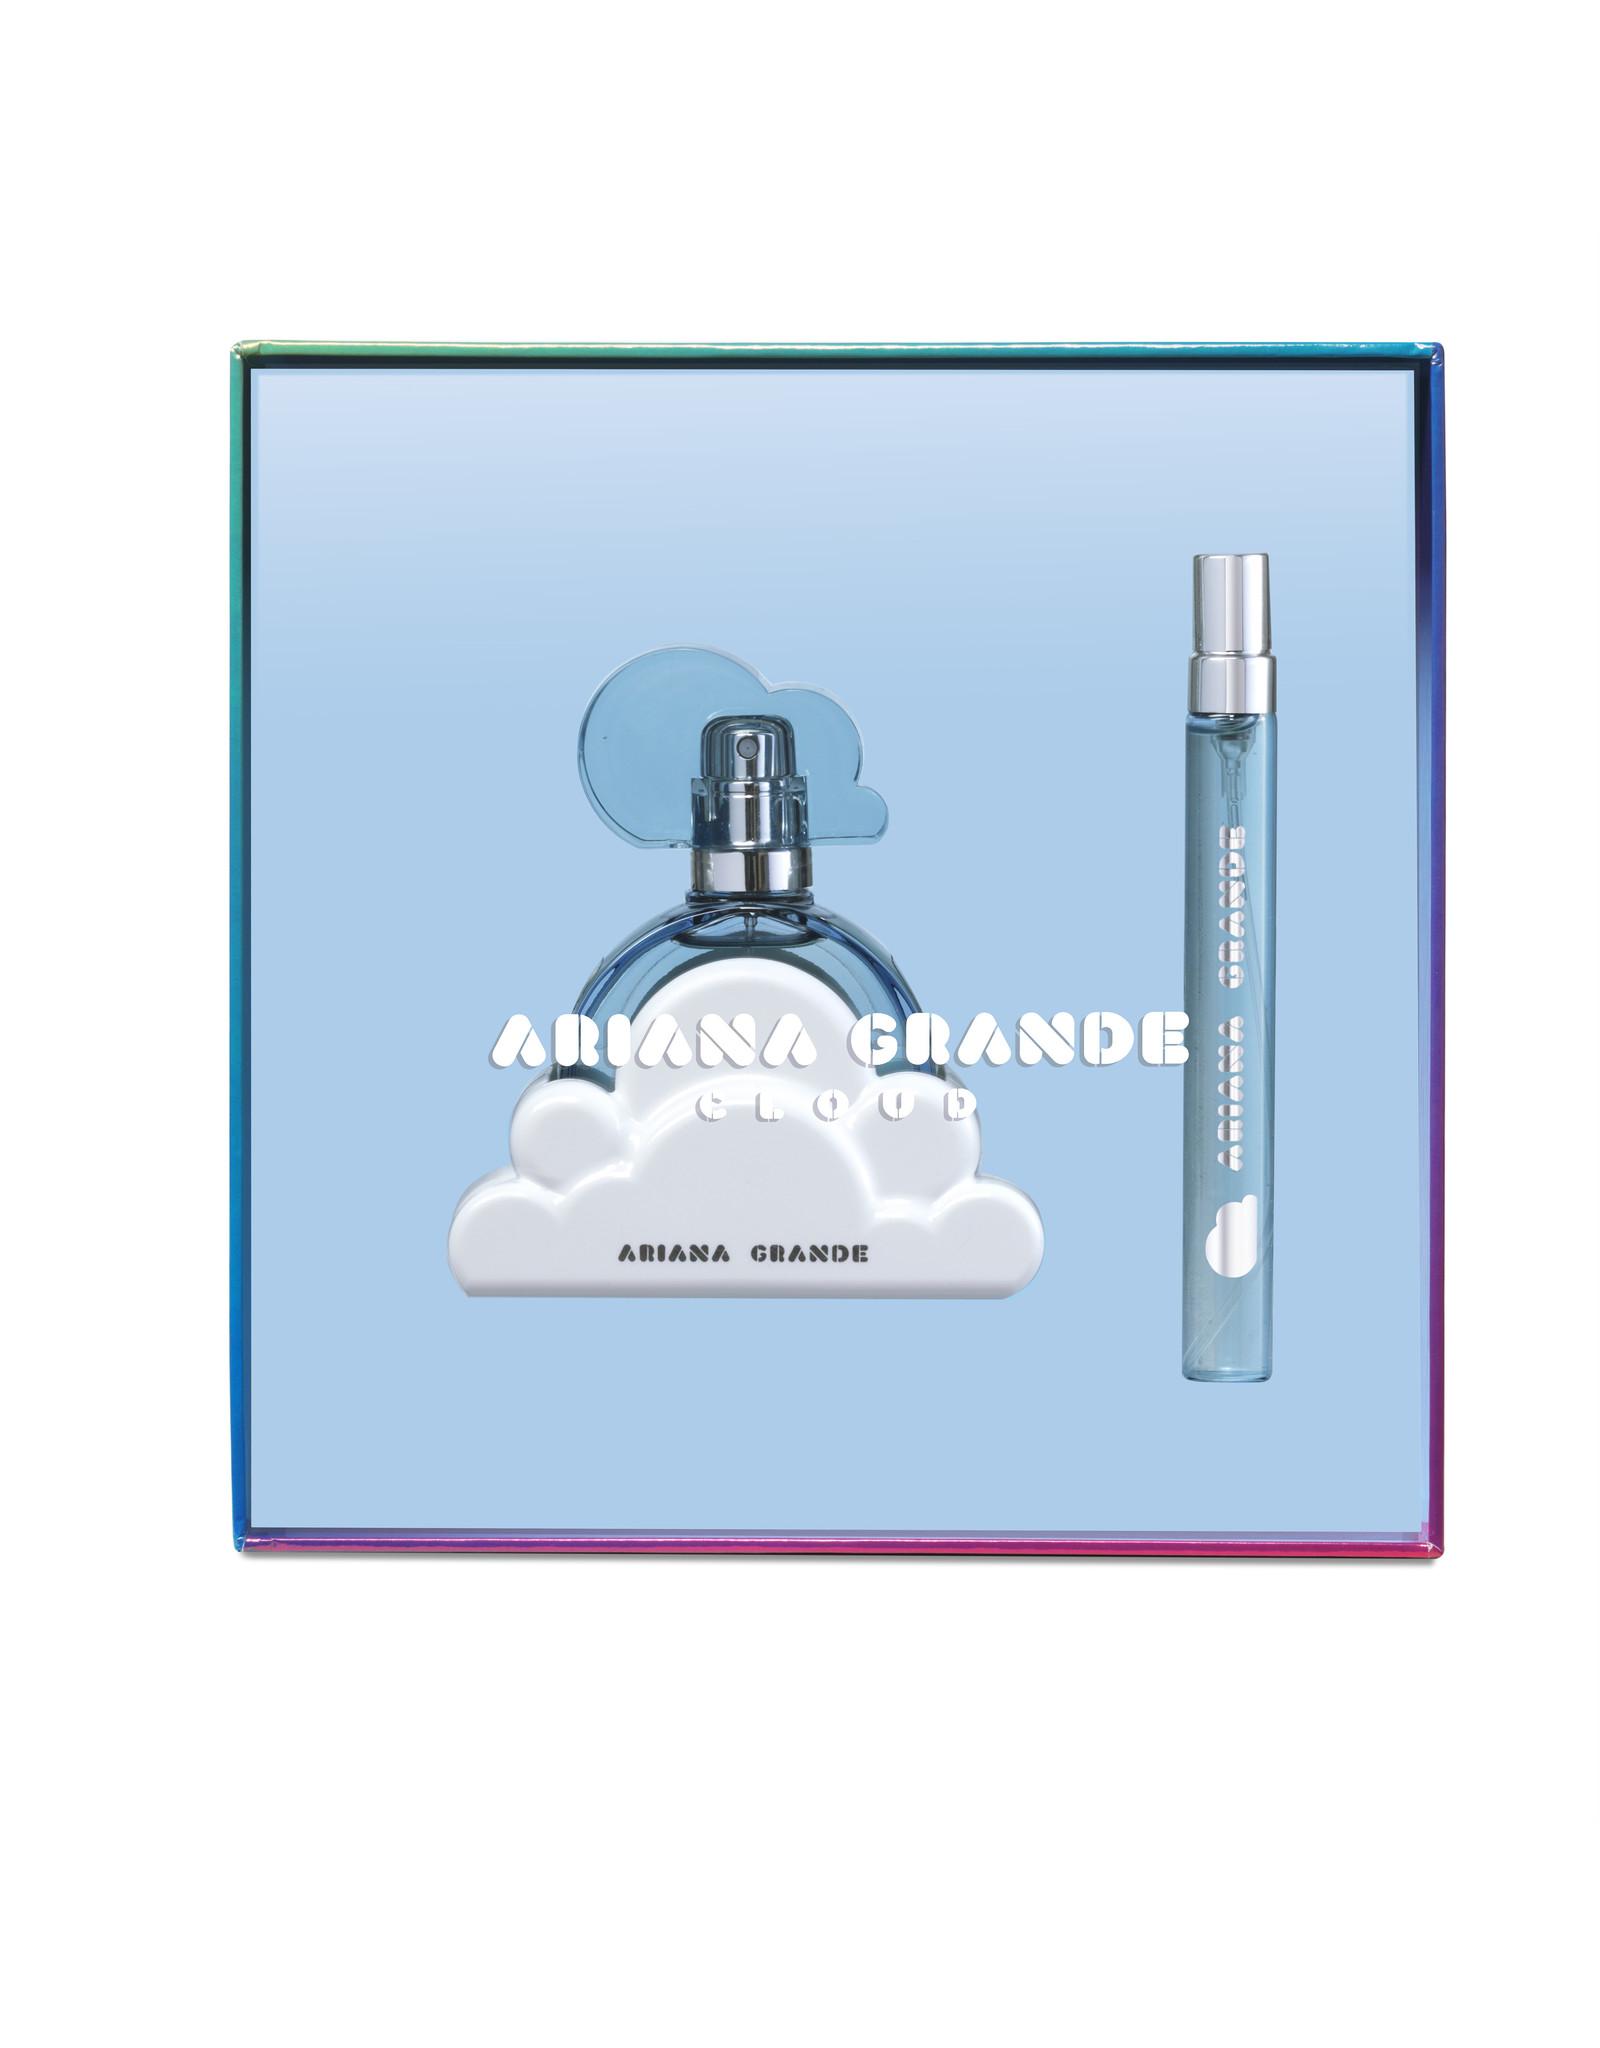 Ariana Grande Coffret Cloud - Eau De Parfum 30 ML en Spray EDP 10 ML - Ariana Grande